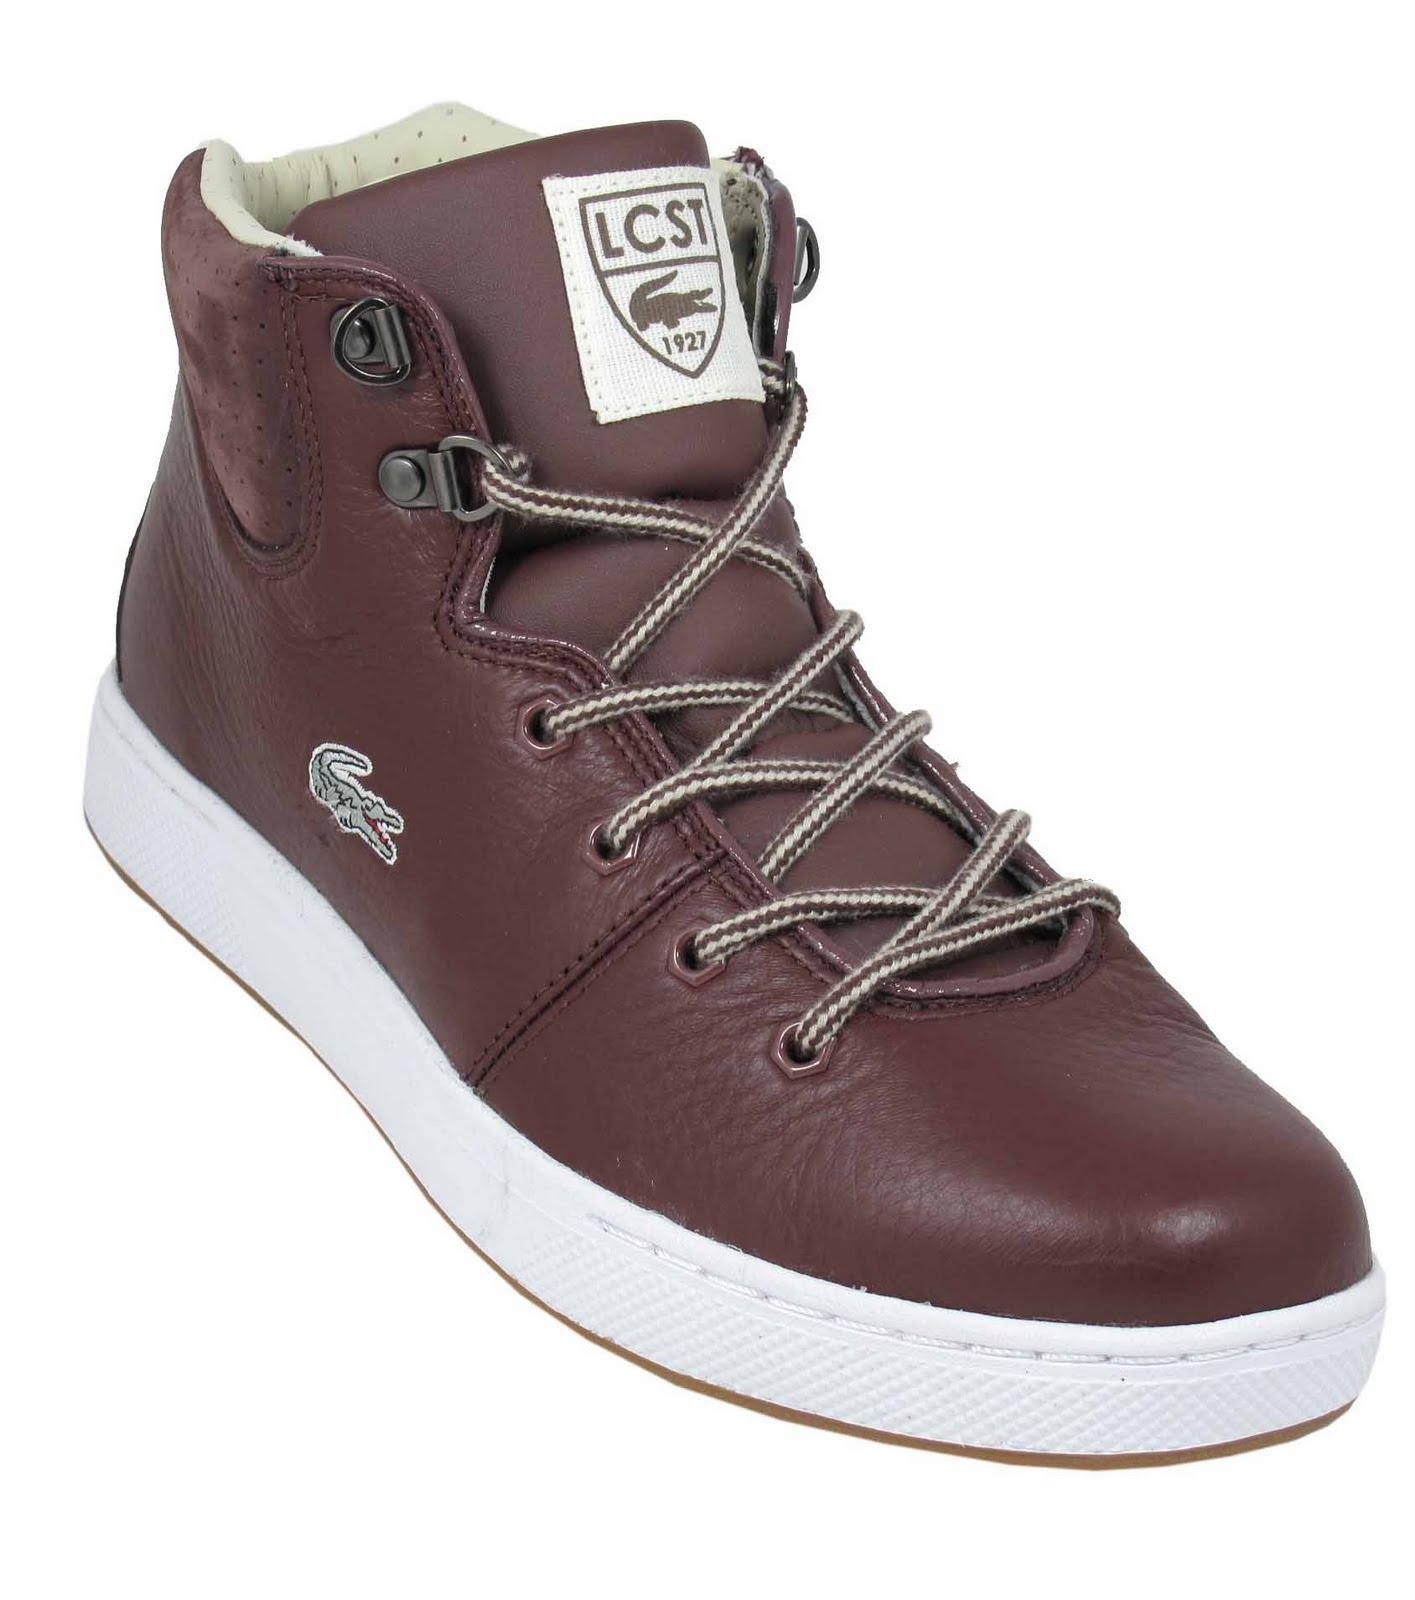 Original   Women39s  Lacoste Women39s Baylen Leather Faux Fur Winter Boots